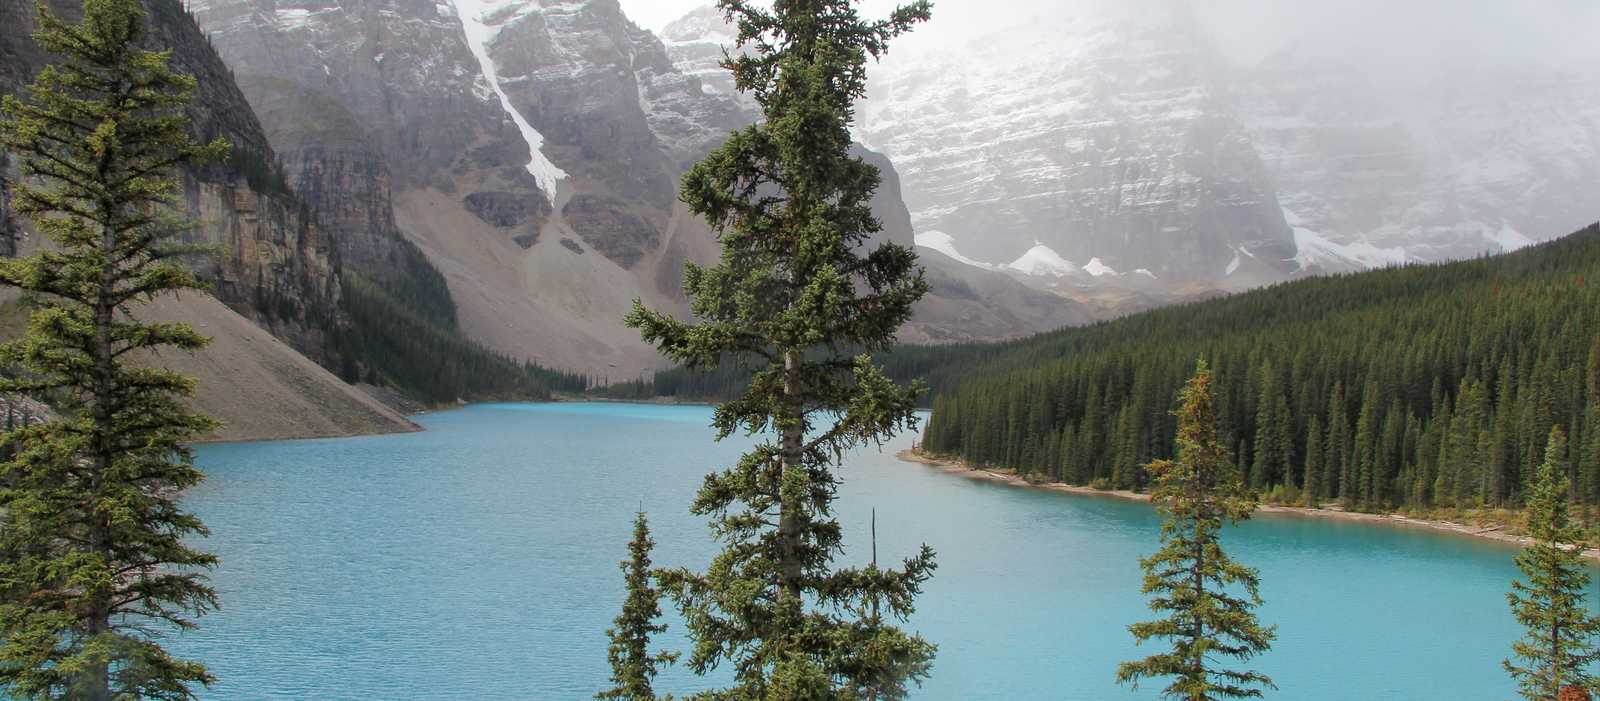 Der türkisblaue Moraine Lake